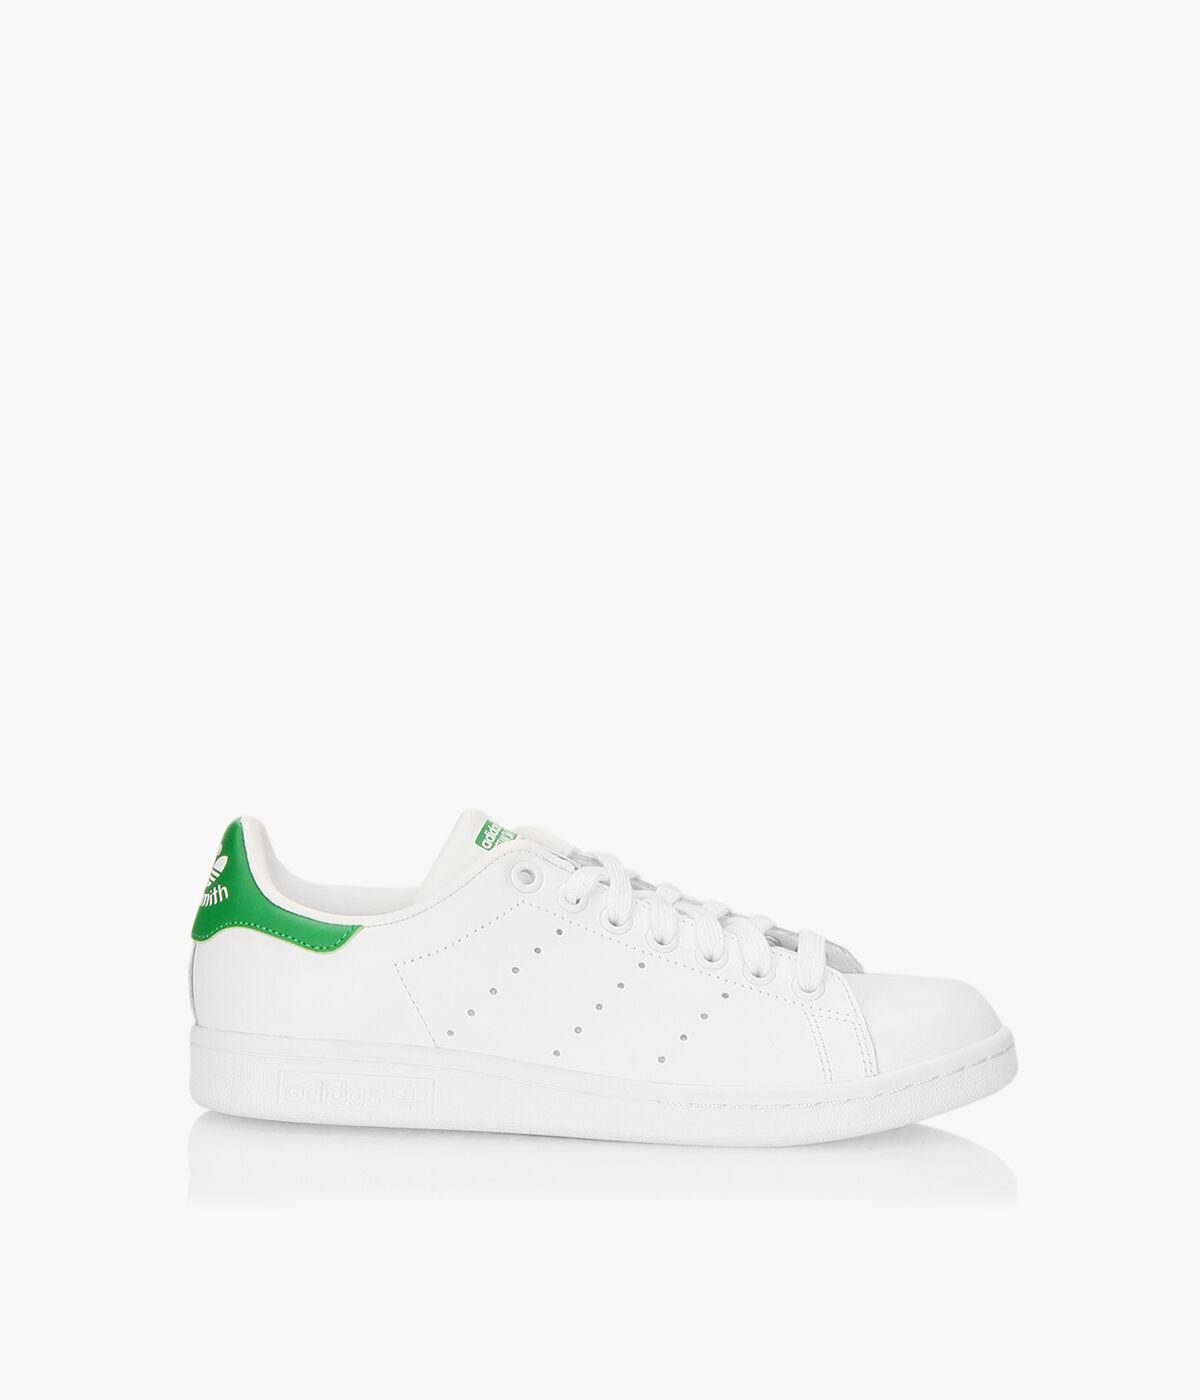 adidas women's shoe styles